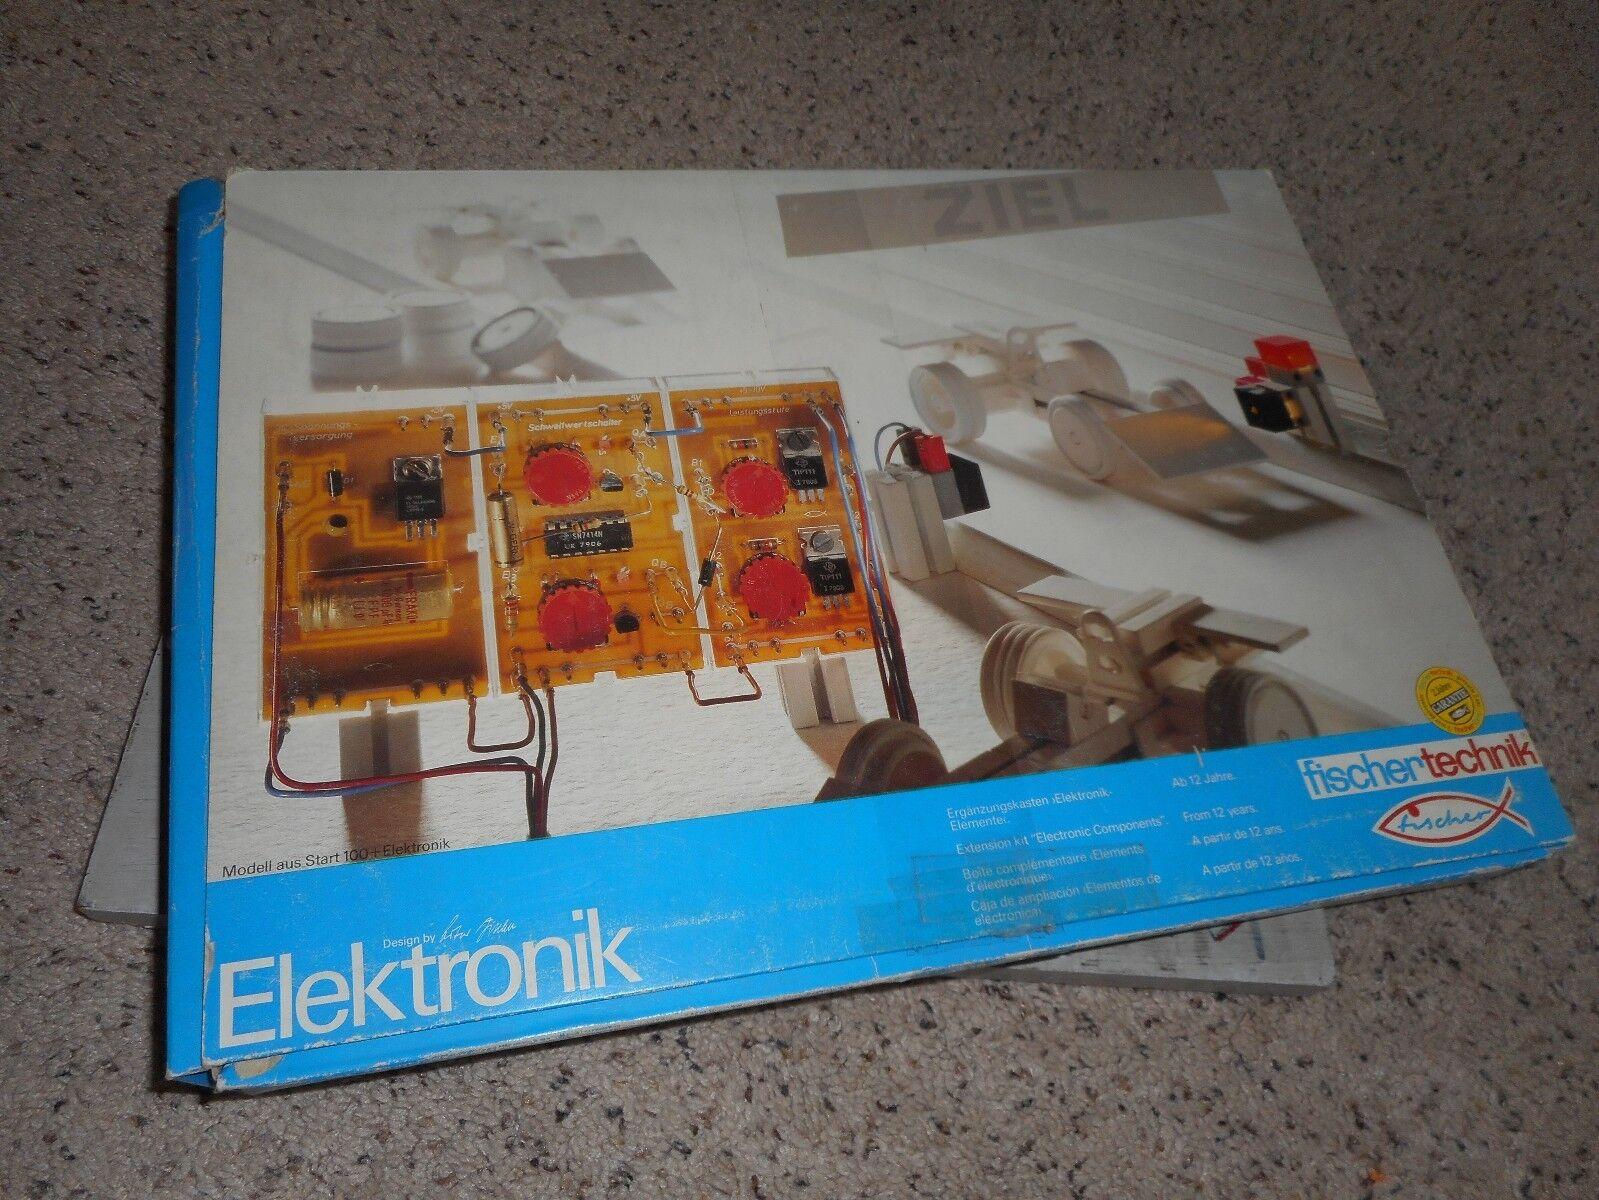 FischerTechnik 30253 Elektronik extension kit electrical components